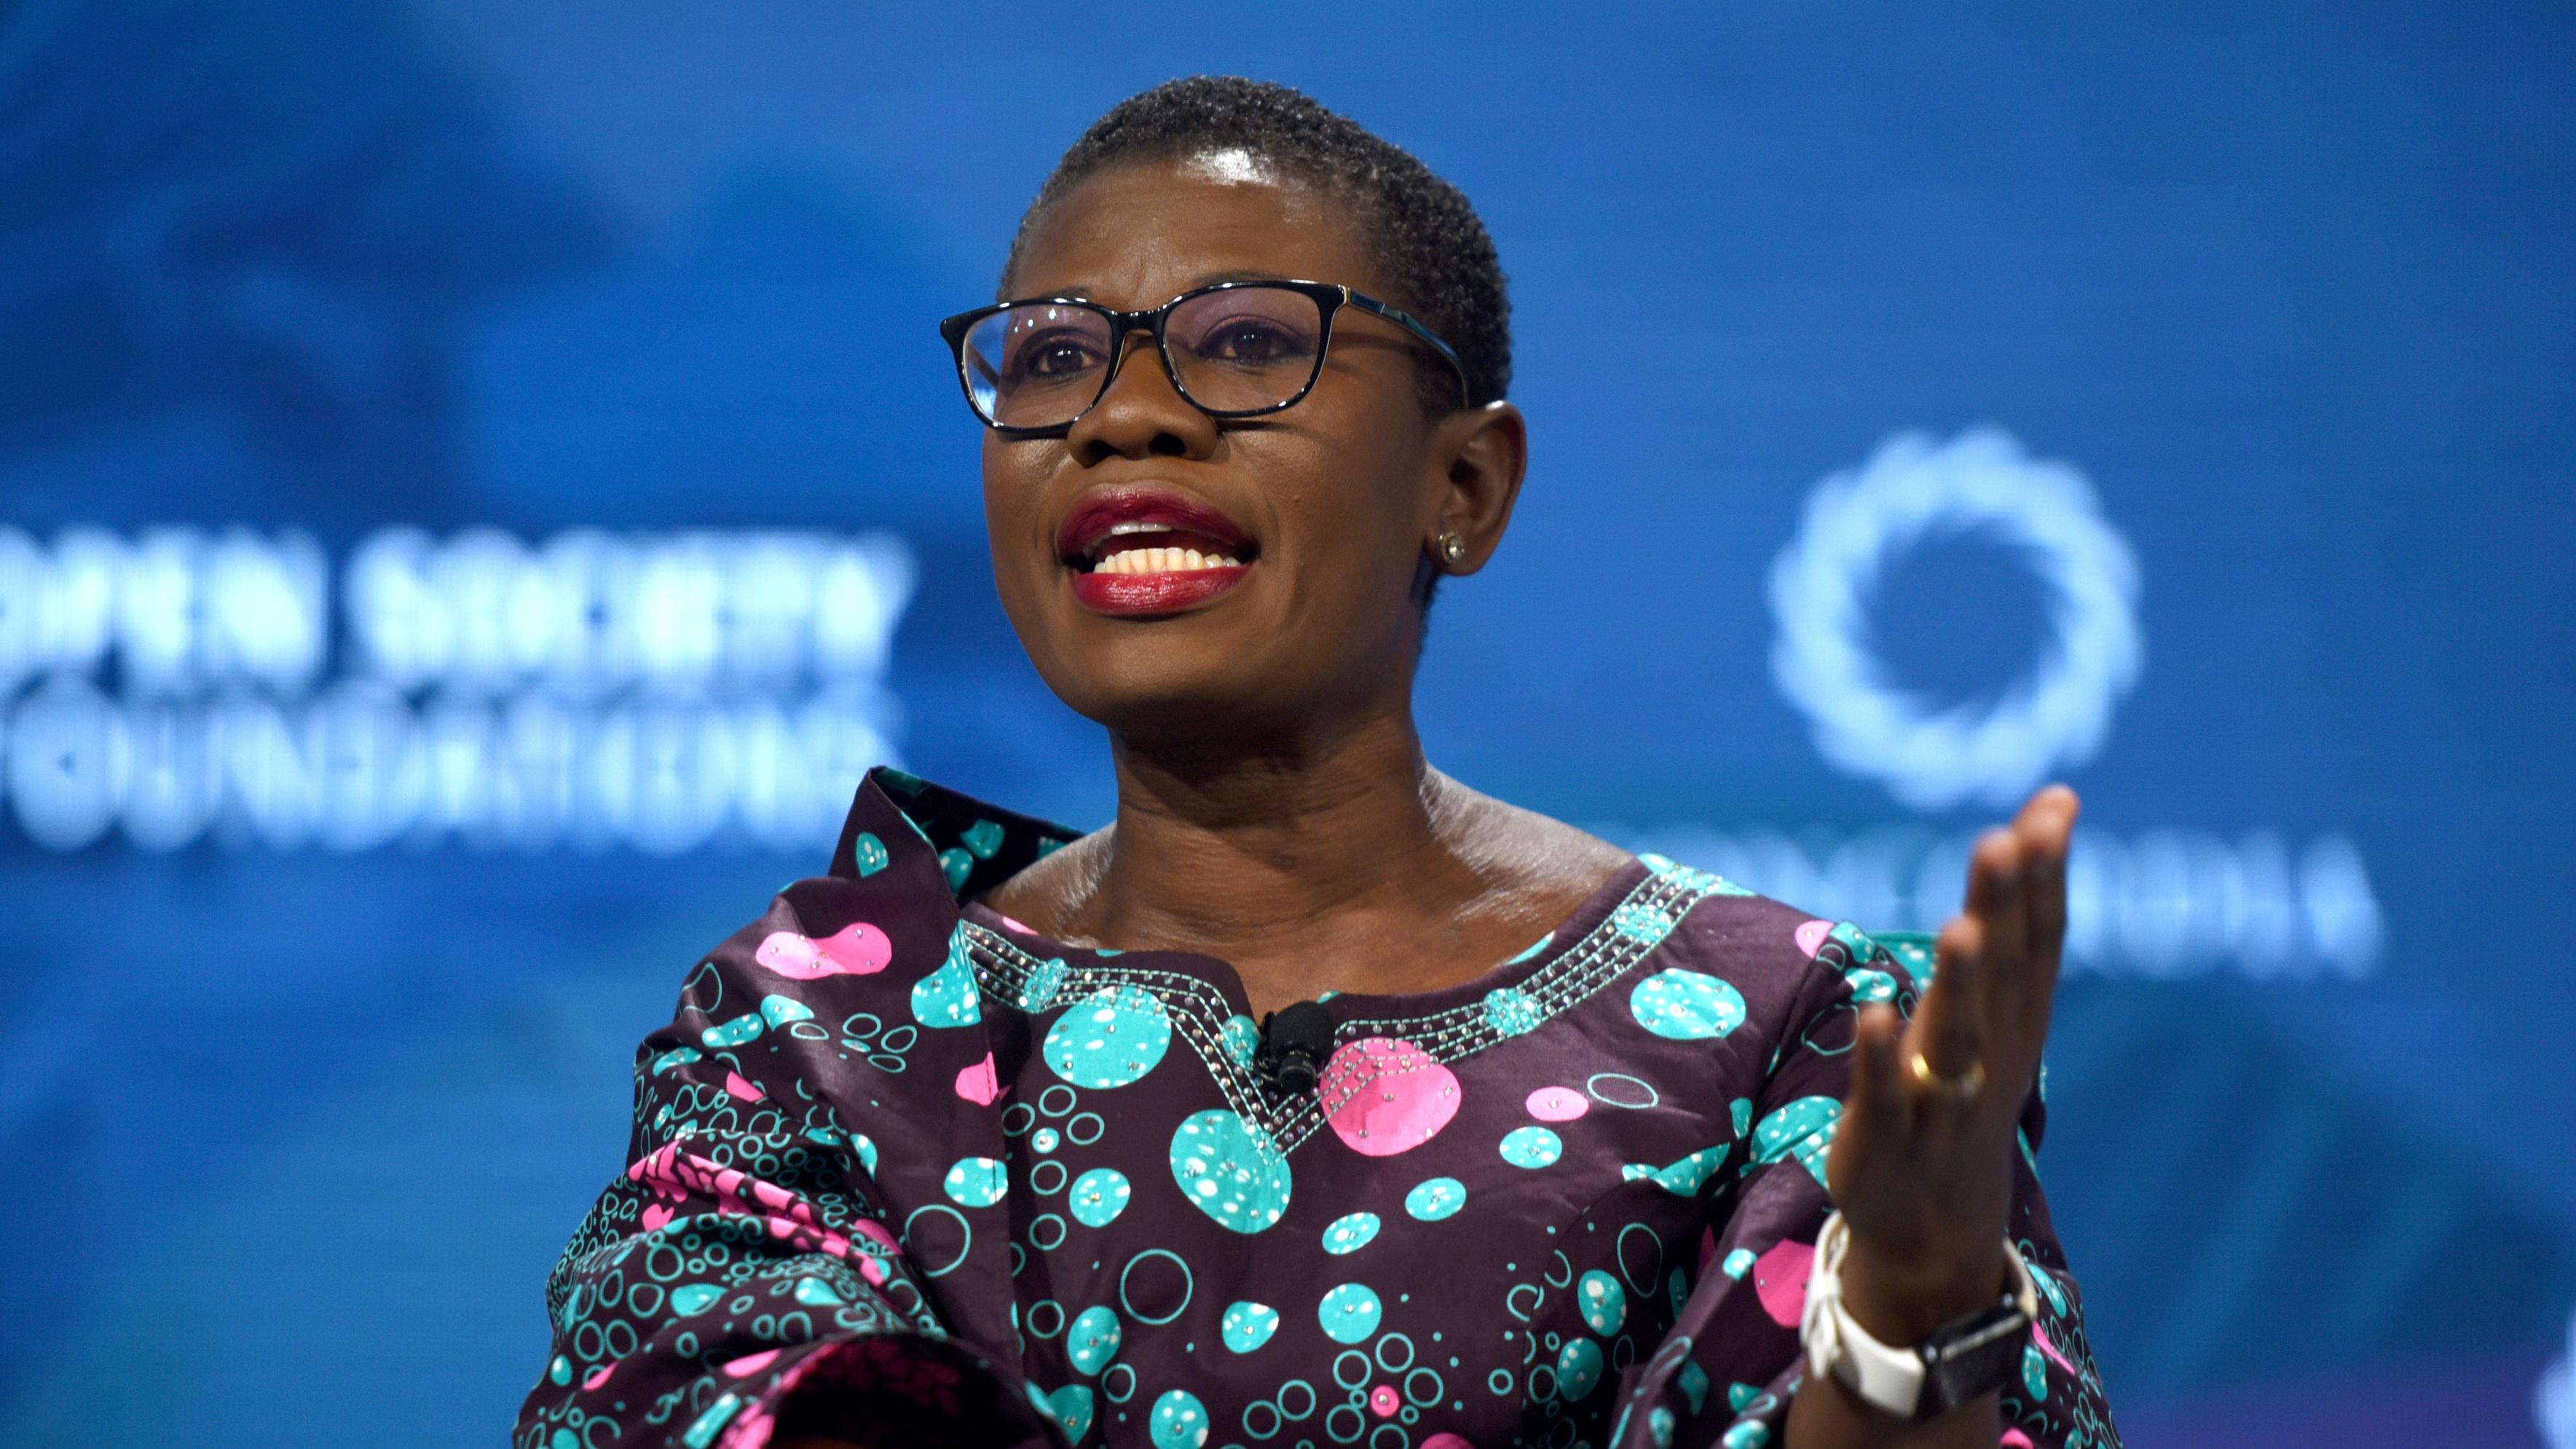 Break Rules Clean Up Gutters: The To-Do List Of A Rookie Mayor In Sierra Leone